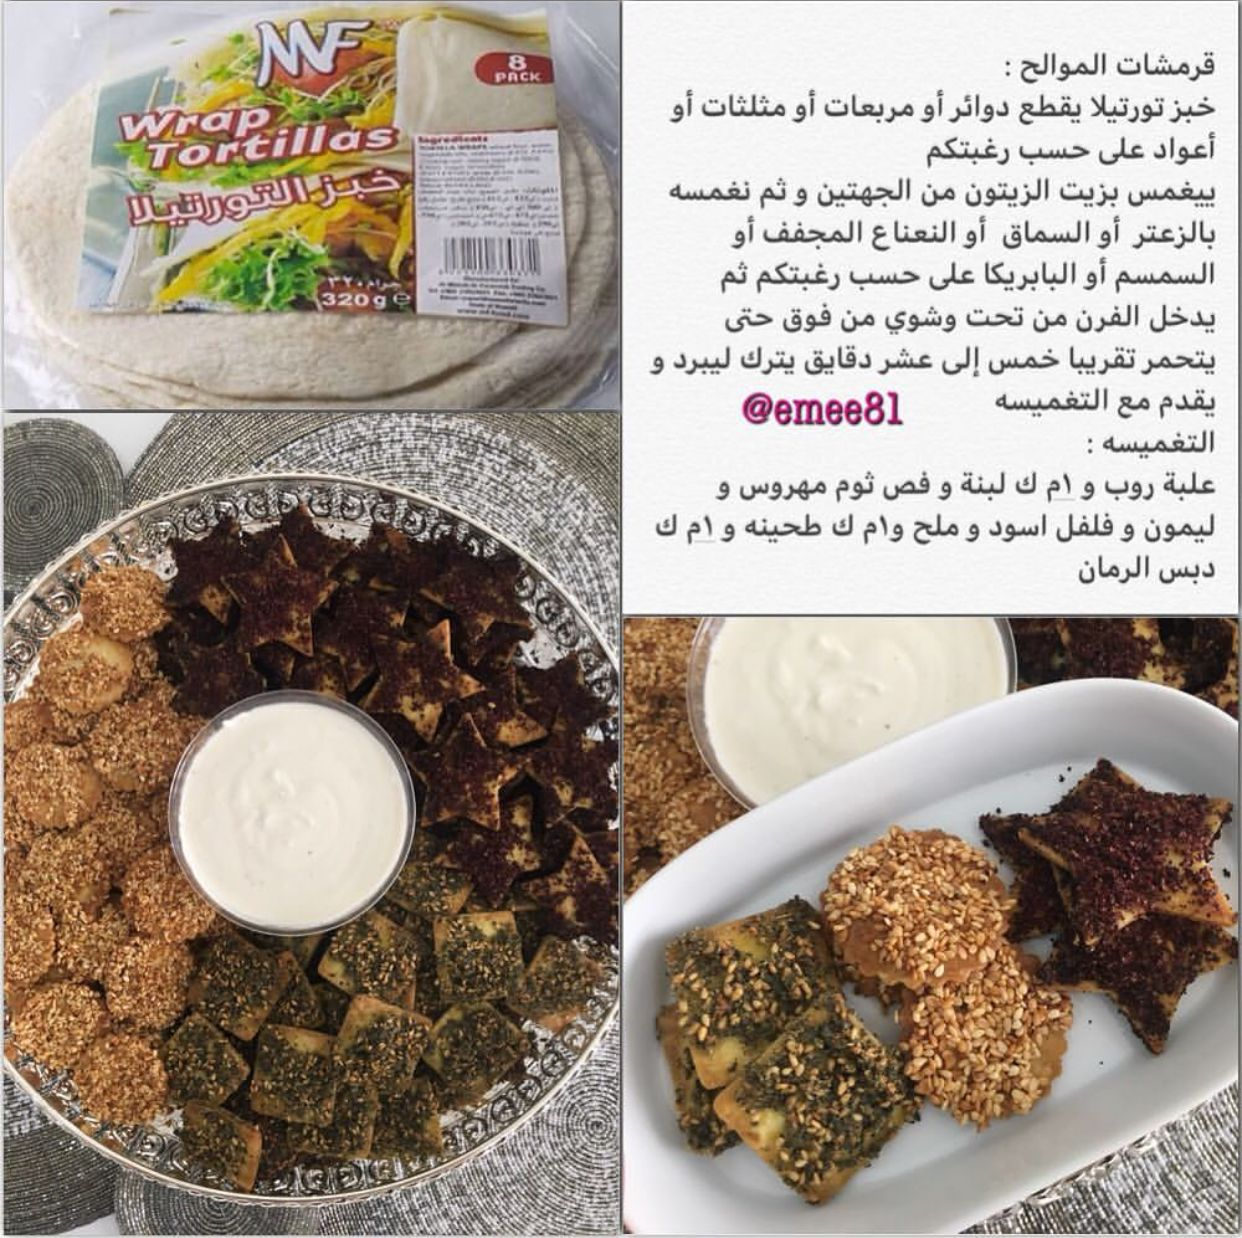 قرمشات موالح Savory Snacks Baby Food Recipes Food And Drink